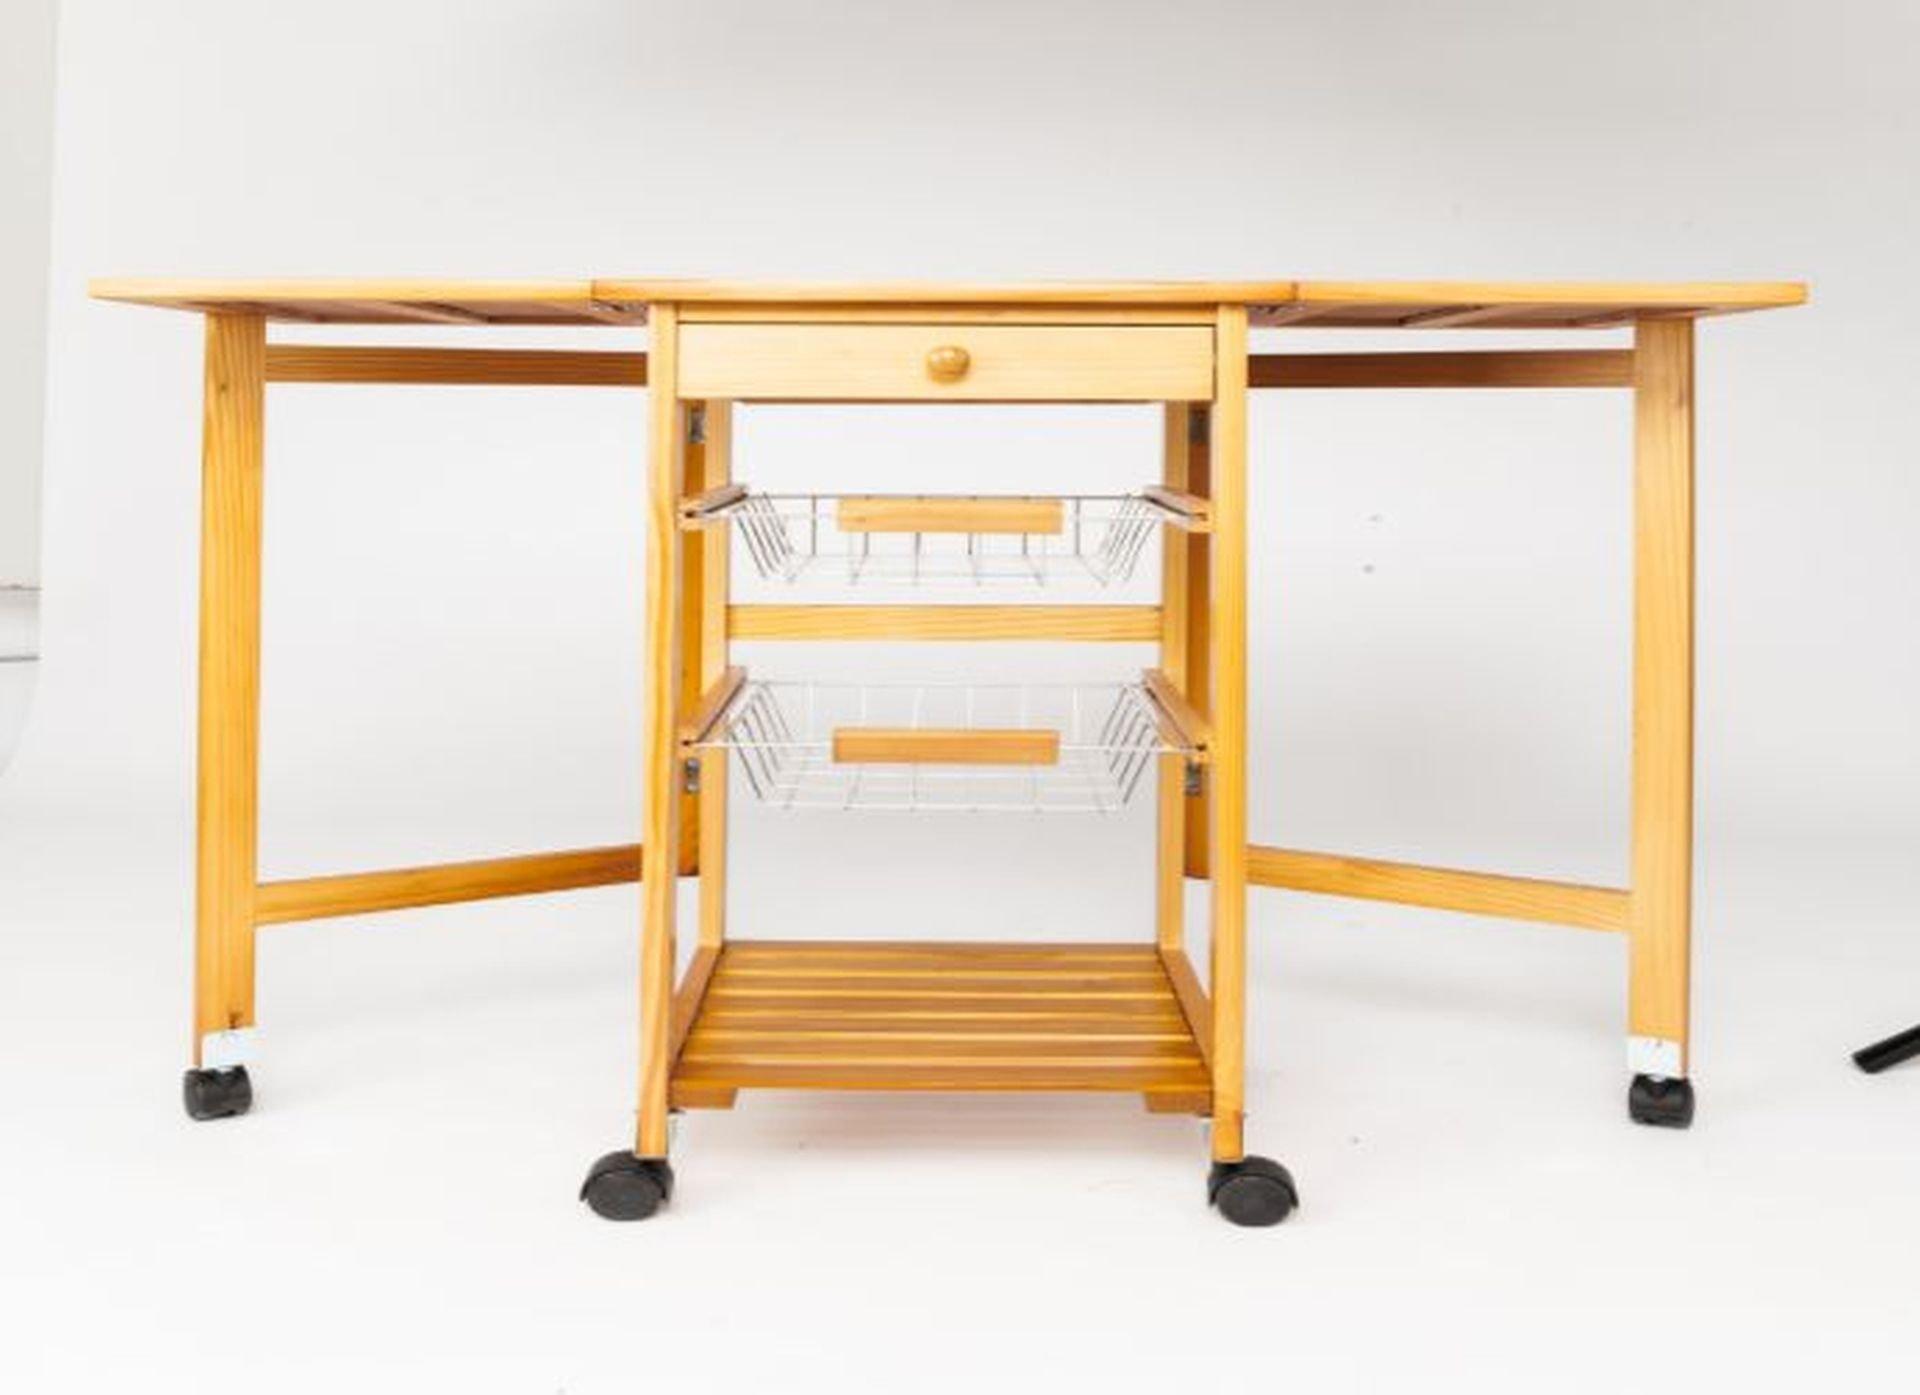 Soogo Portable Rolling Drop Leaf Kitchen Storage Trolley Cart Island Sapele Color